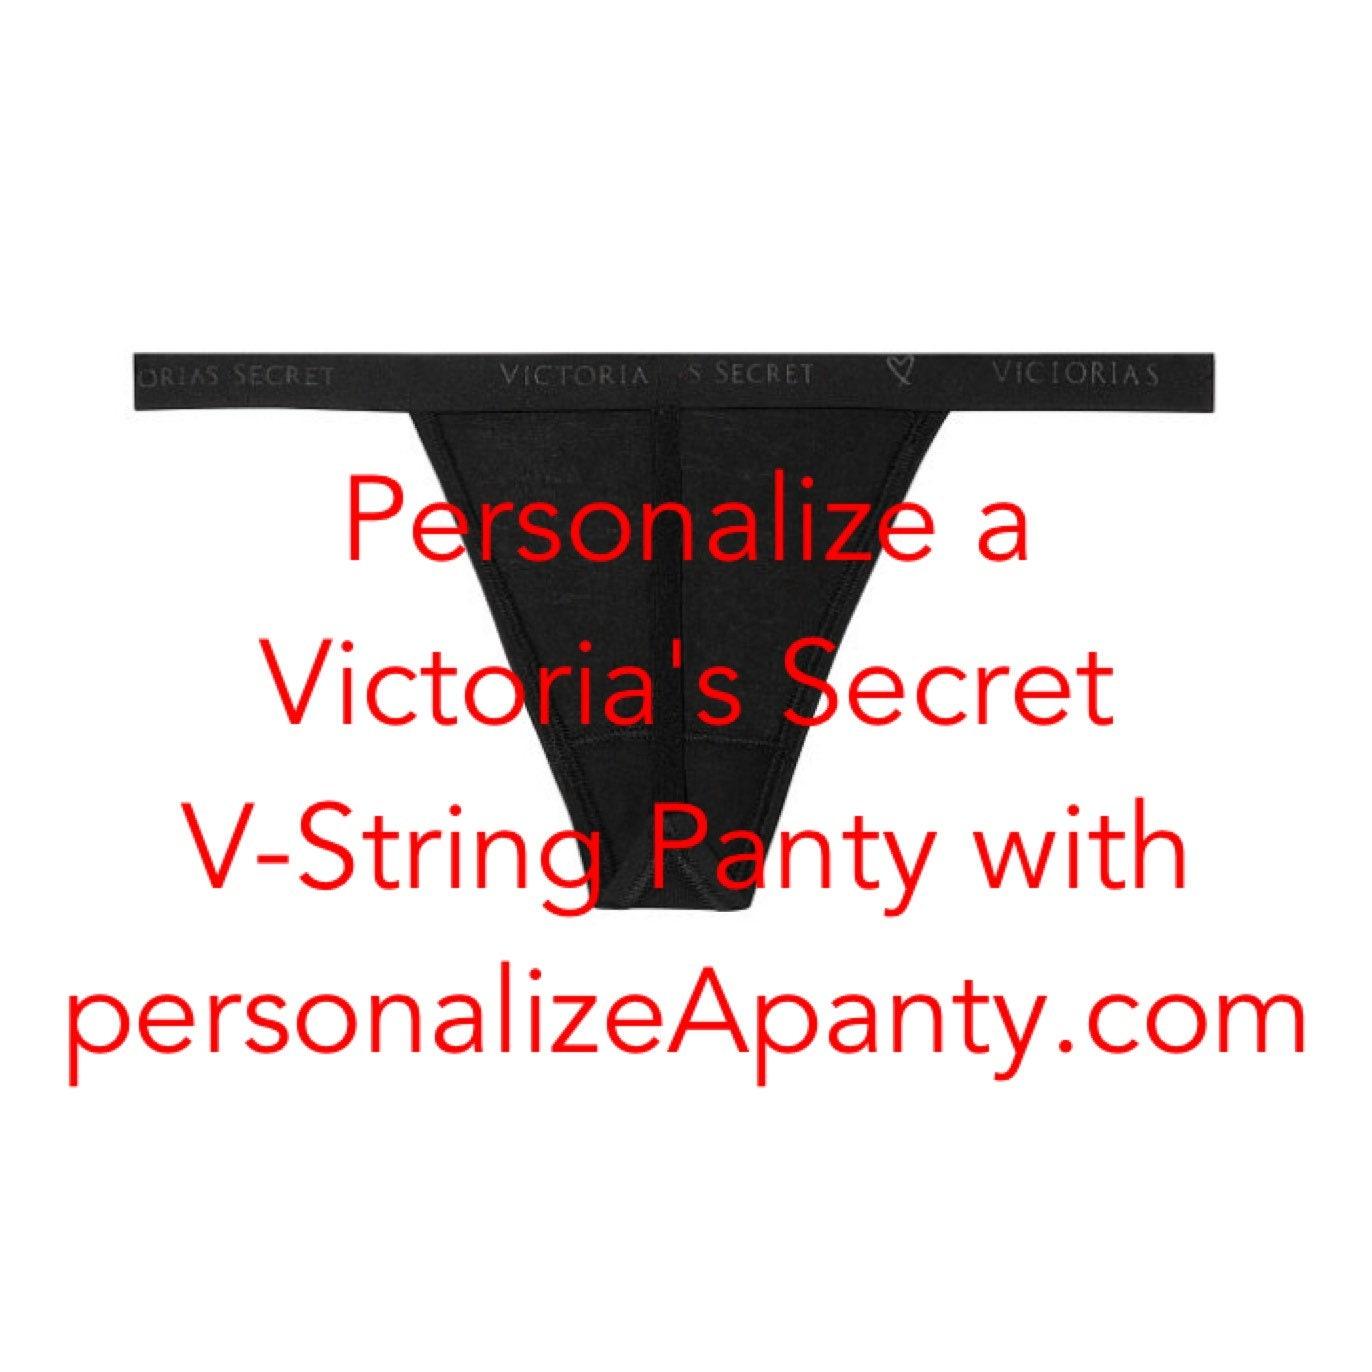 847821ef8652 Personalize a Victoria's Secret STRETCH COTTON black V-string Panty